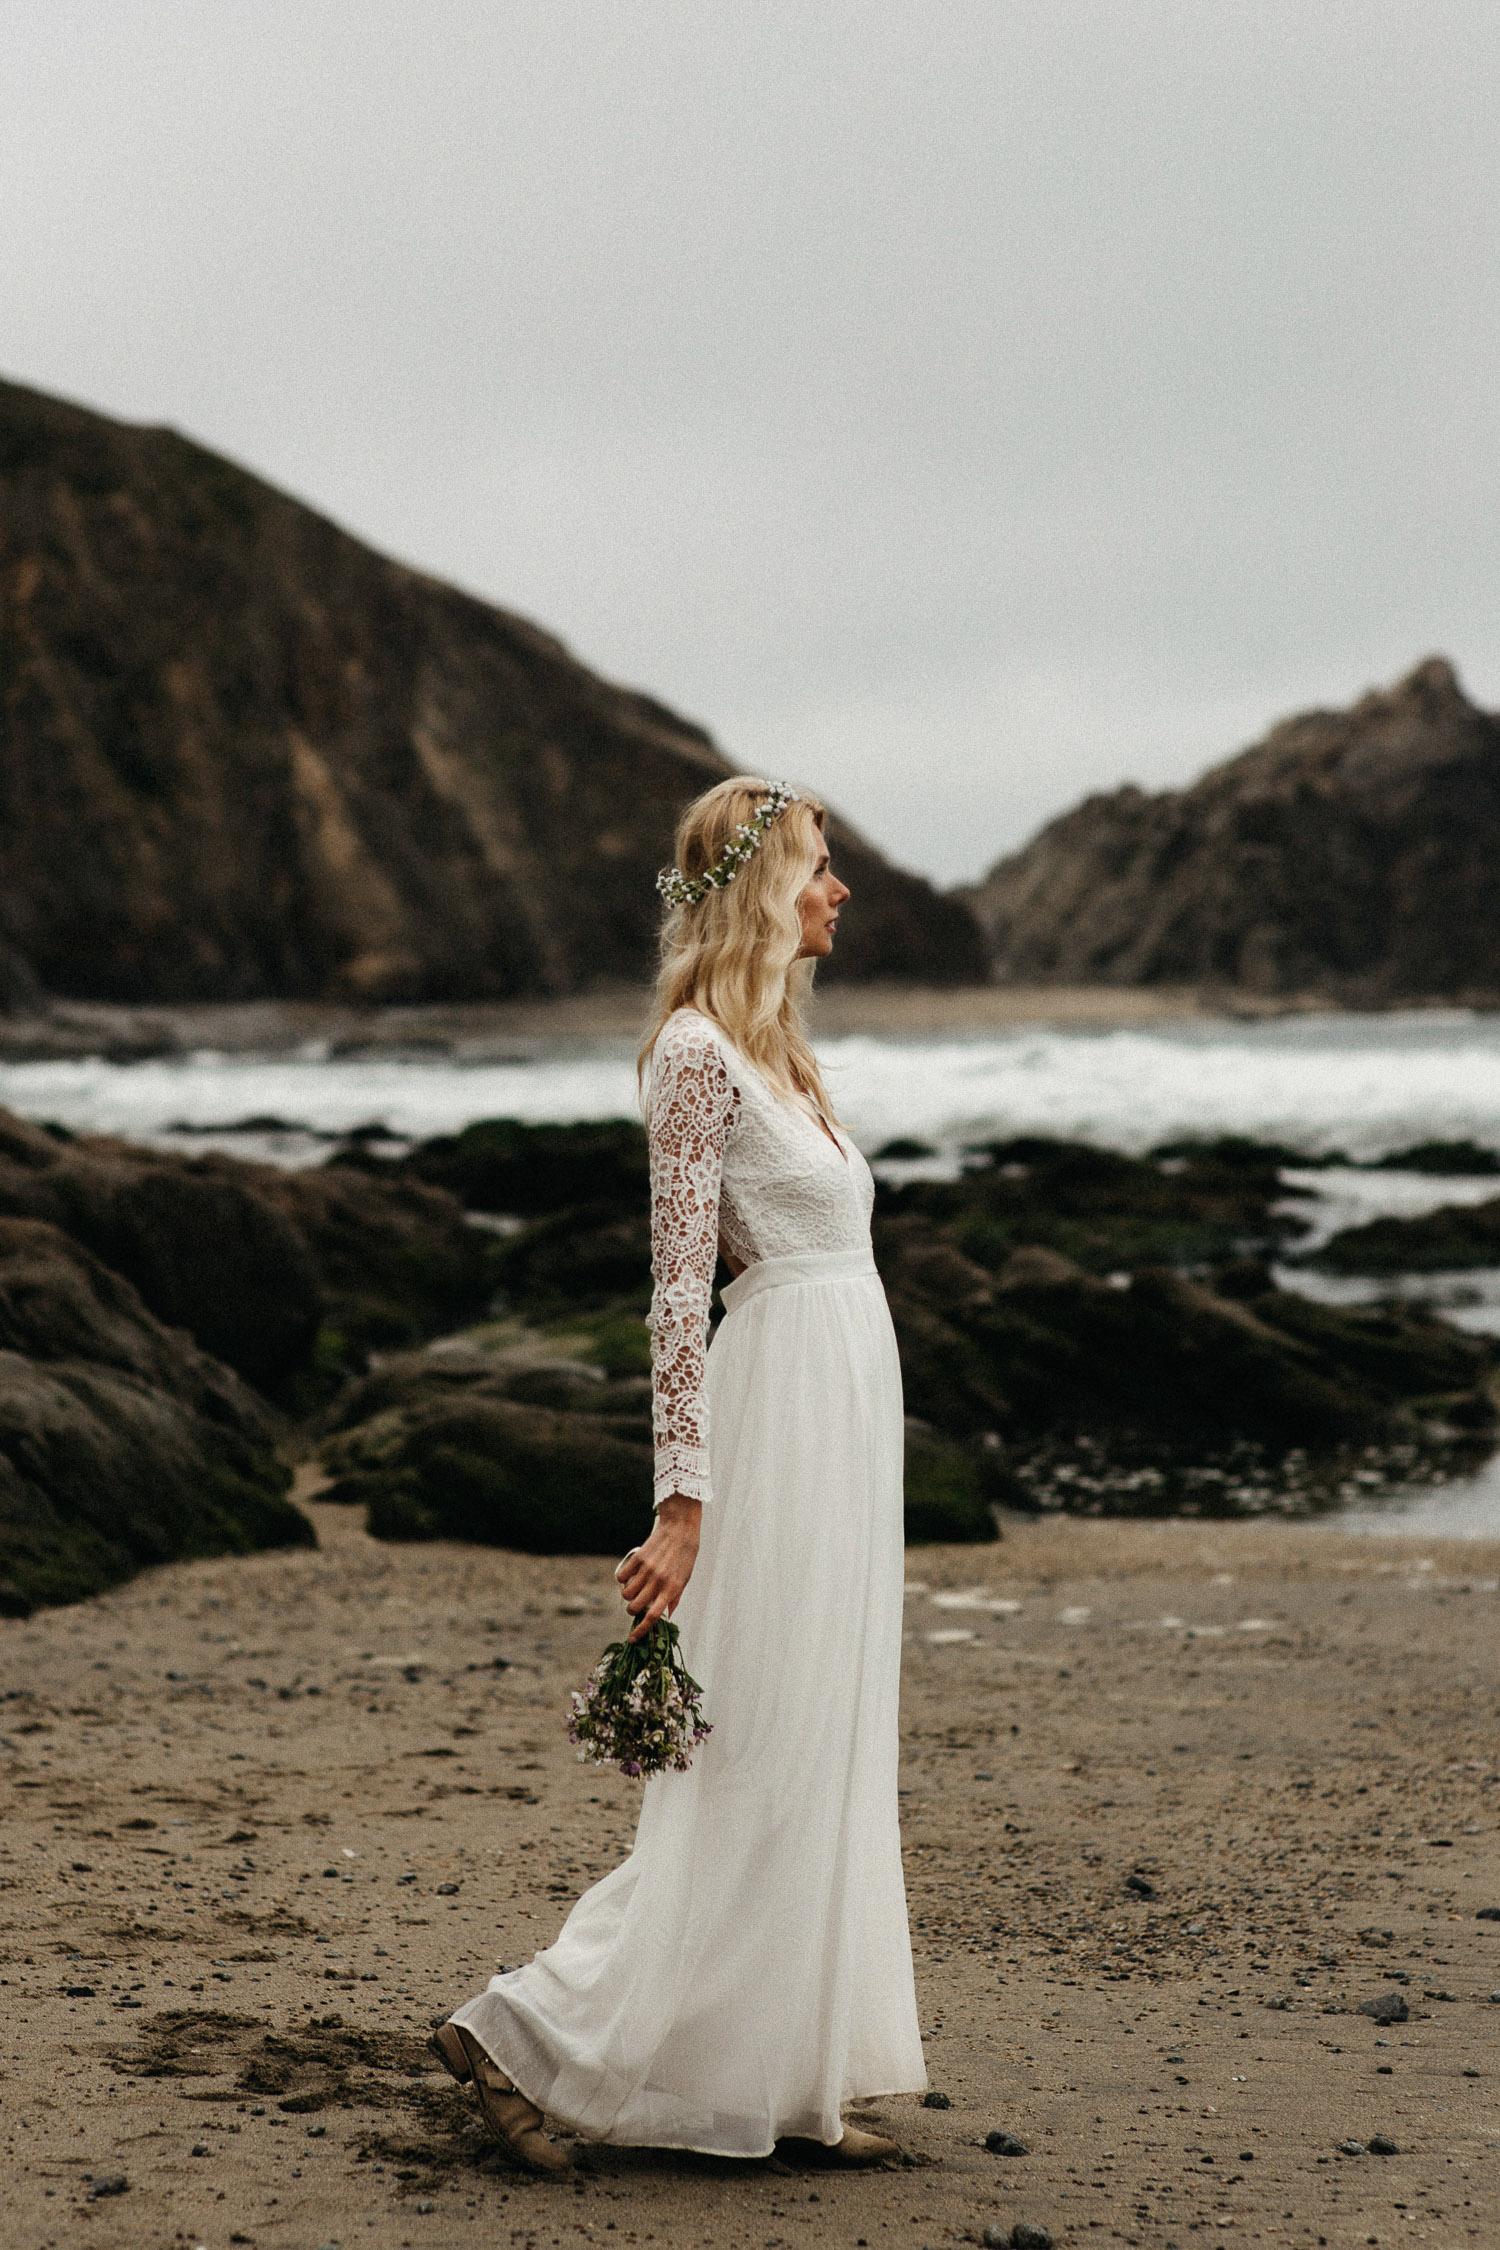 Image of bride portrait on beach